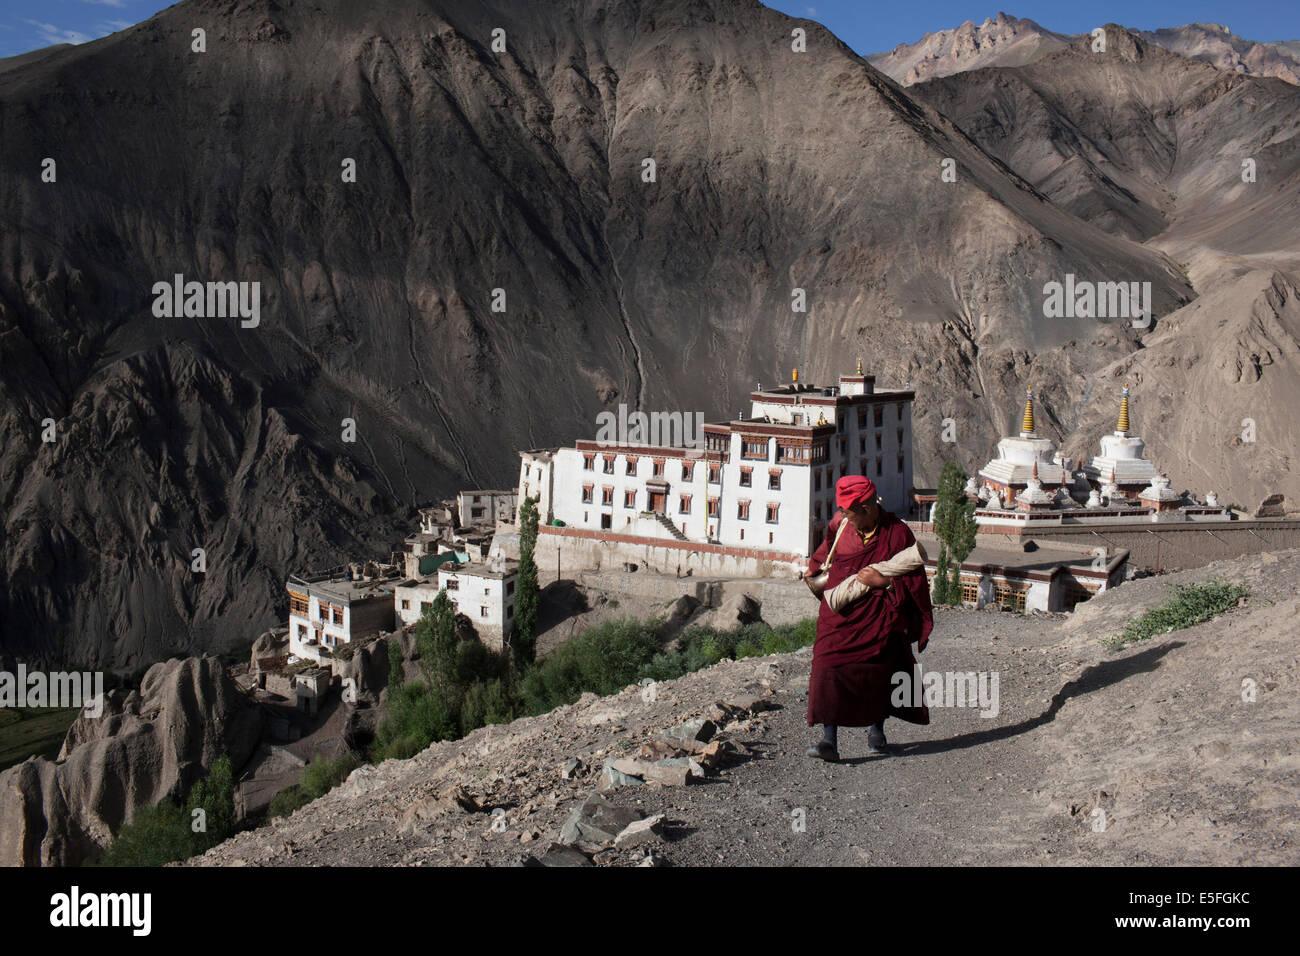 A monk at Lamayuru Monastery in Ladakha - Stock Image